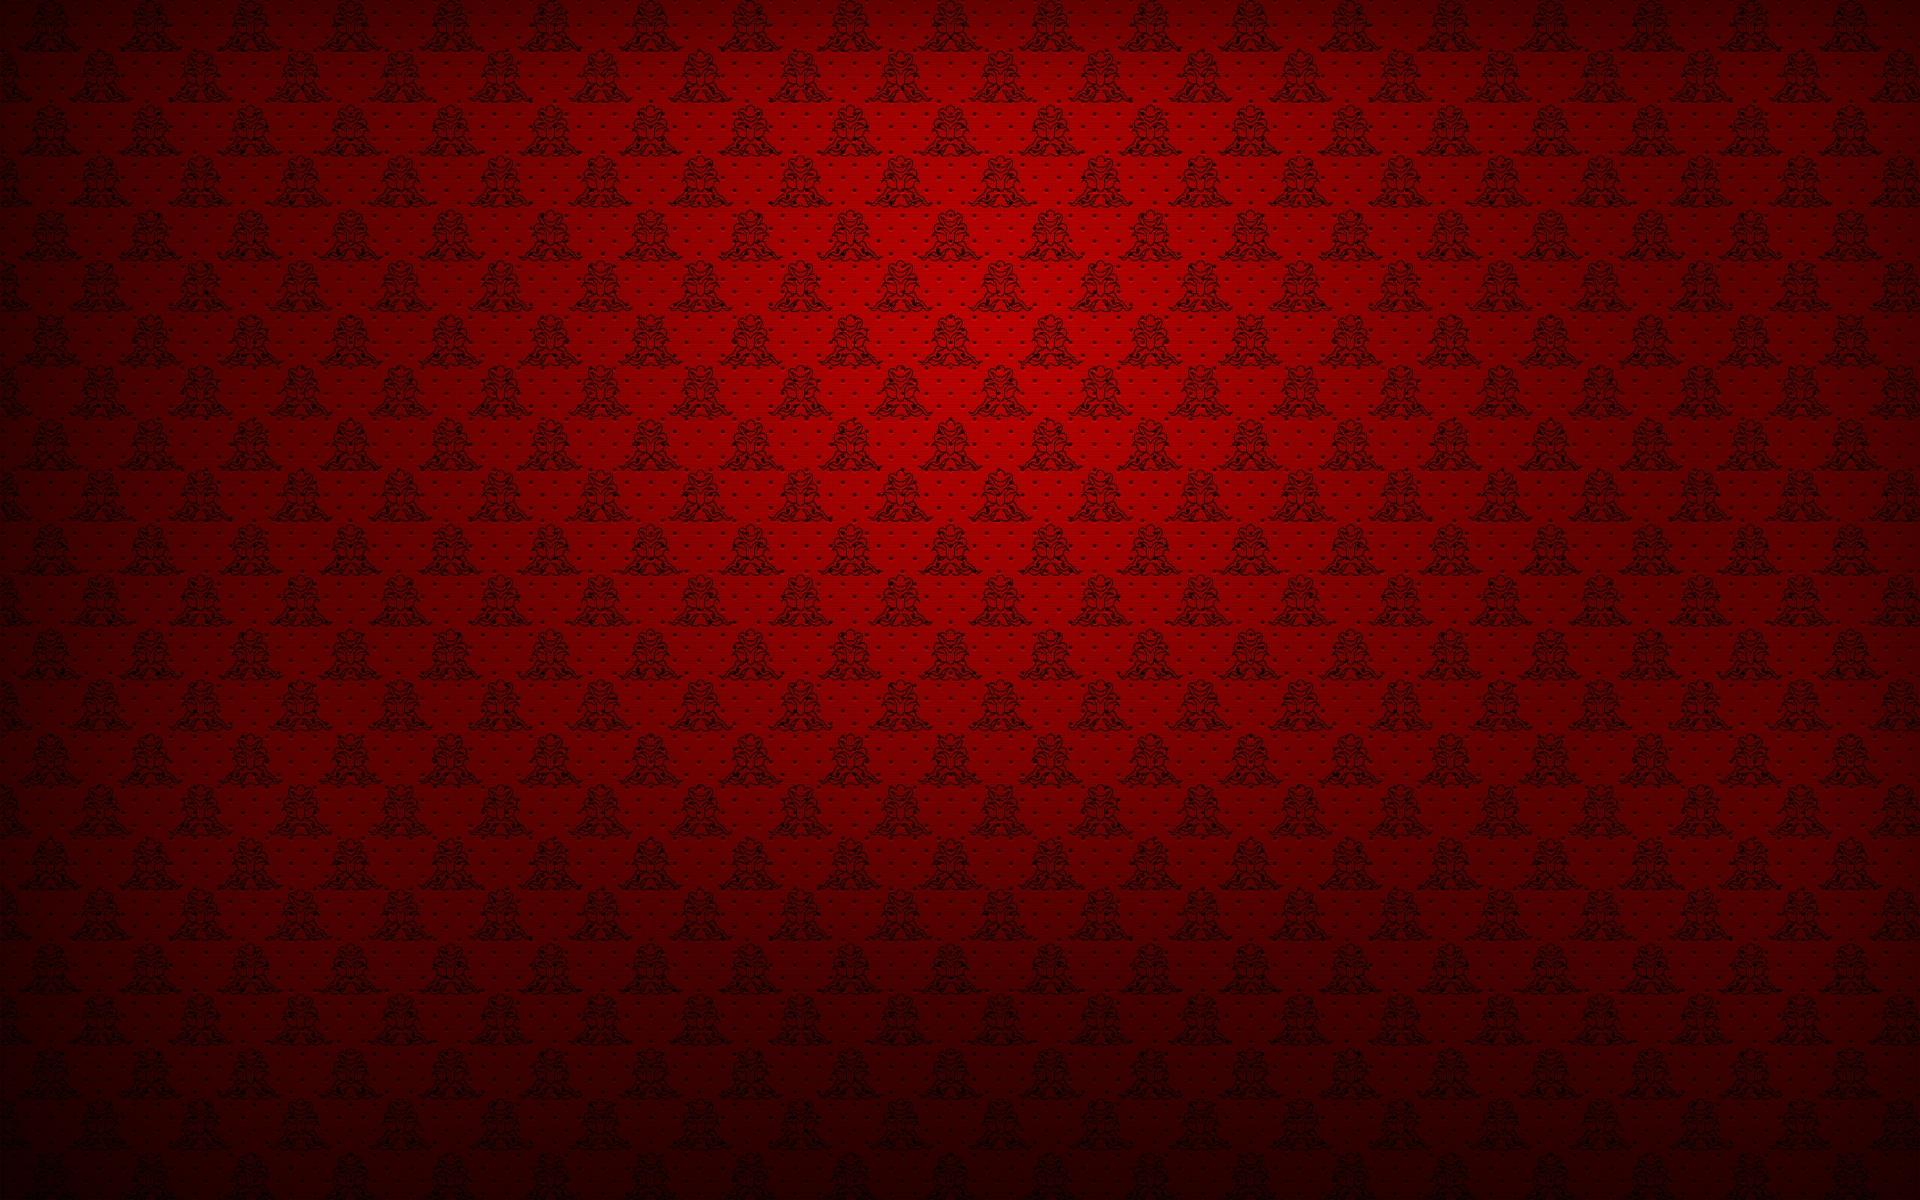 [Resim: pattern_texture11904xs8c.jpg]